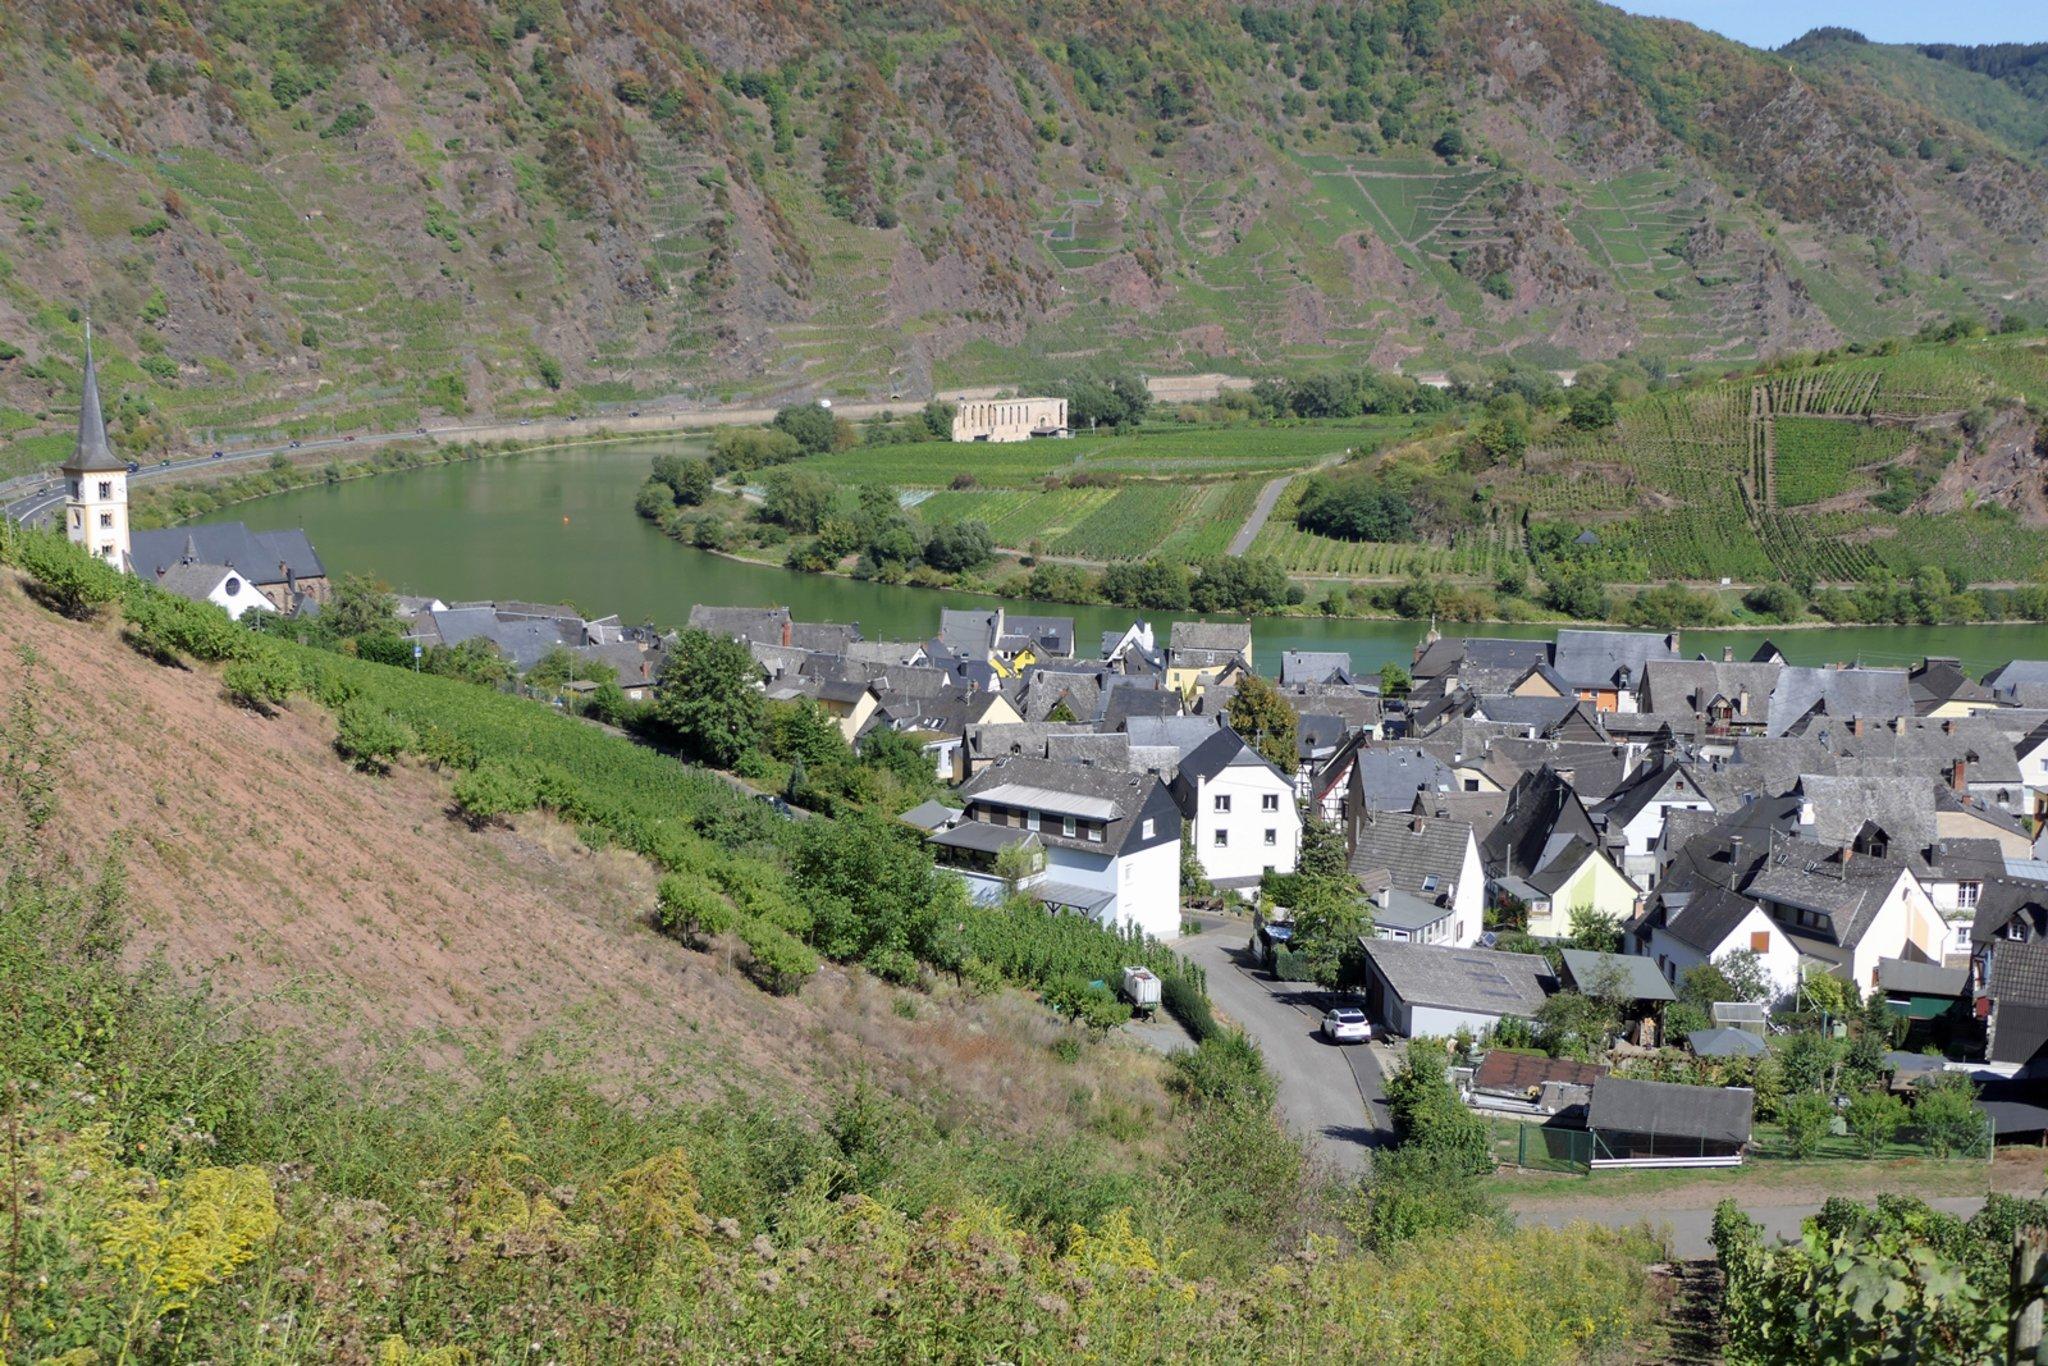 Calmont Klettersteig Unfälle : Calmont klettersteig duisburg